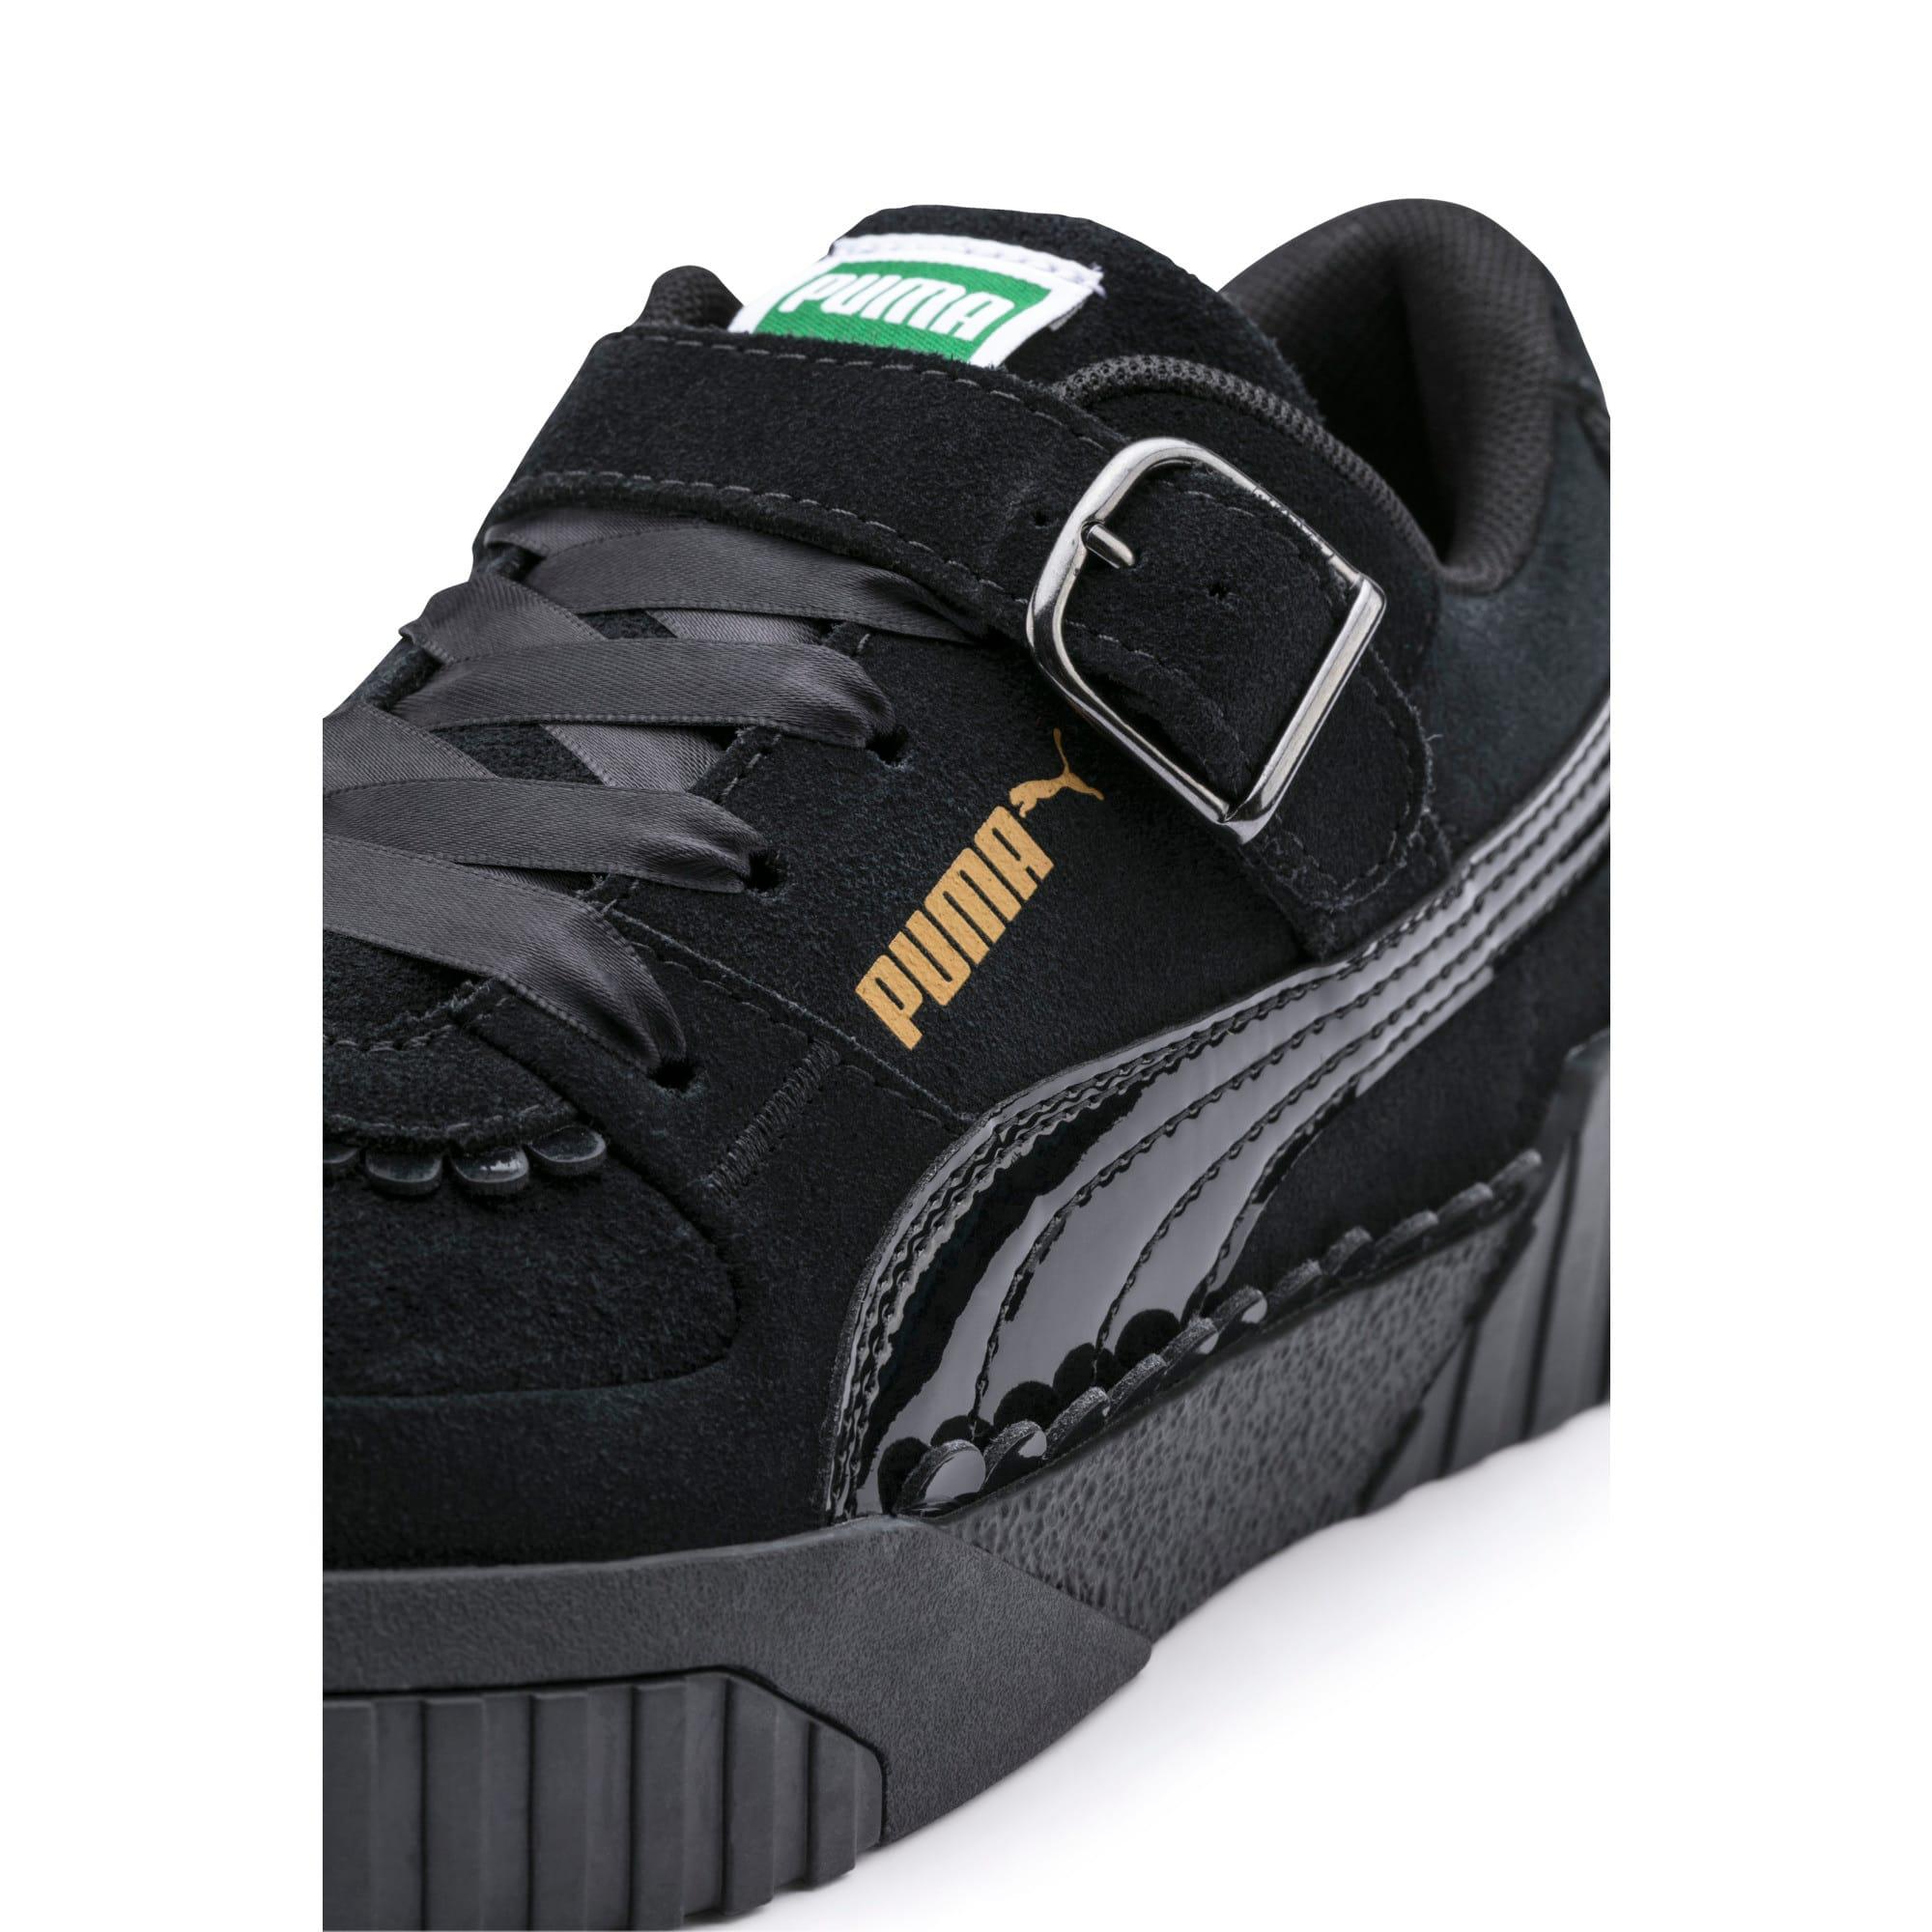 Thumbnail 10 of PUMA x TYAKASHA Cali Women's Sneakers, Puma Black, medium